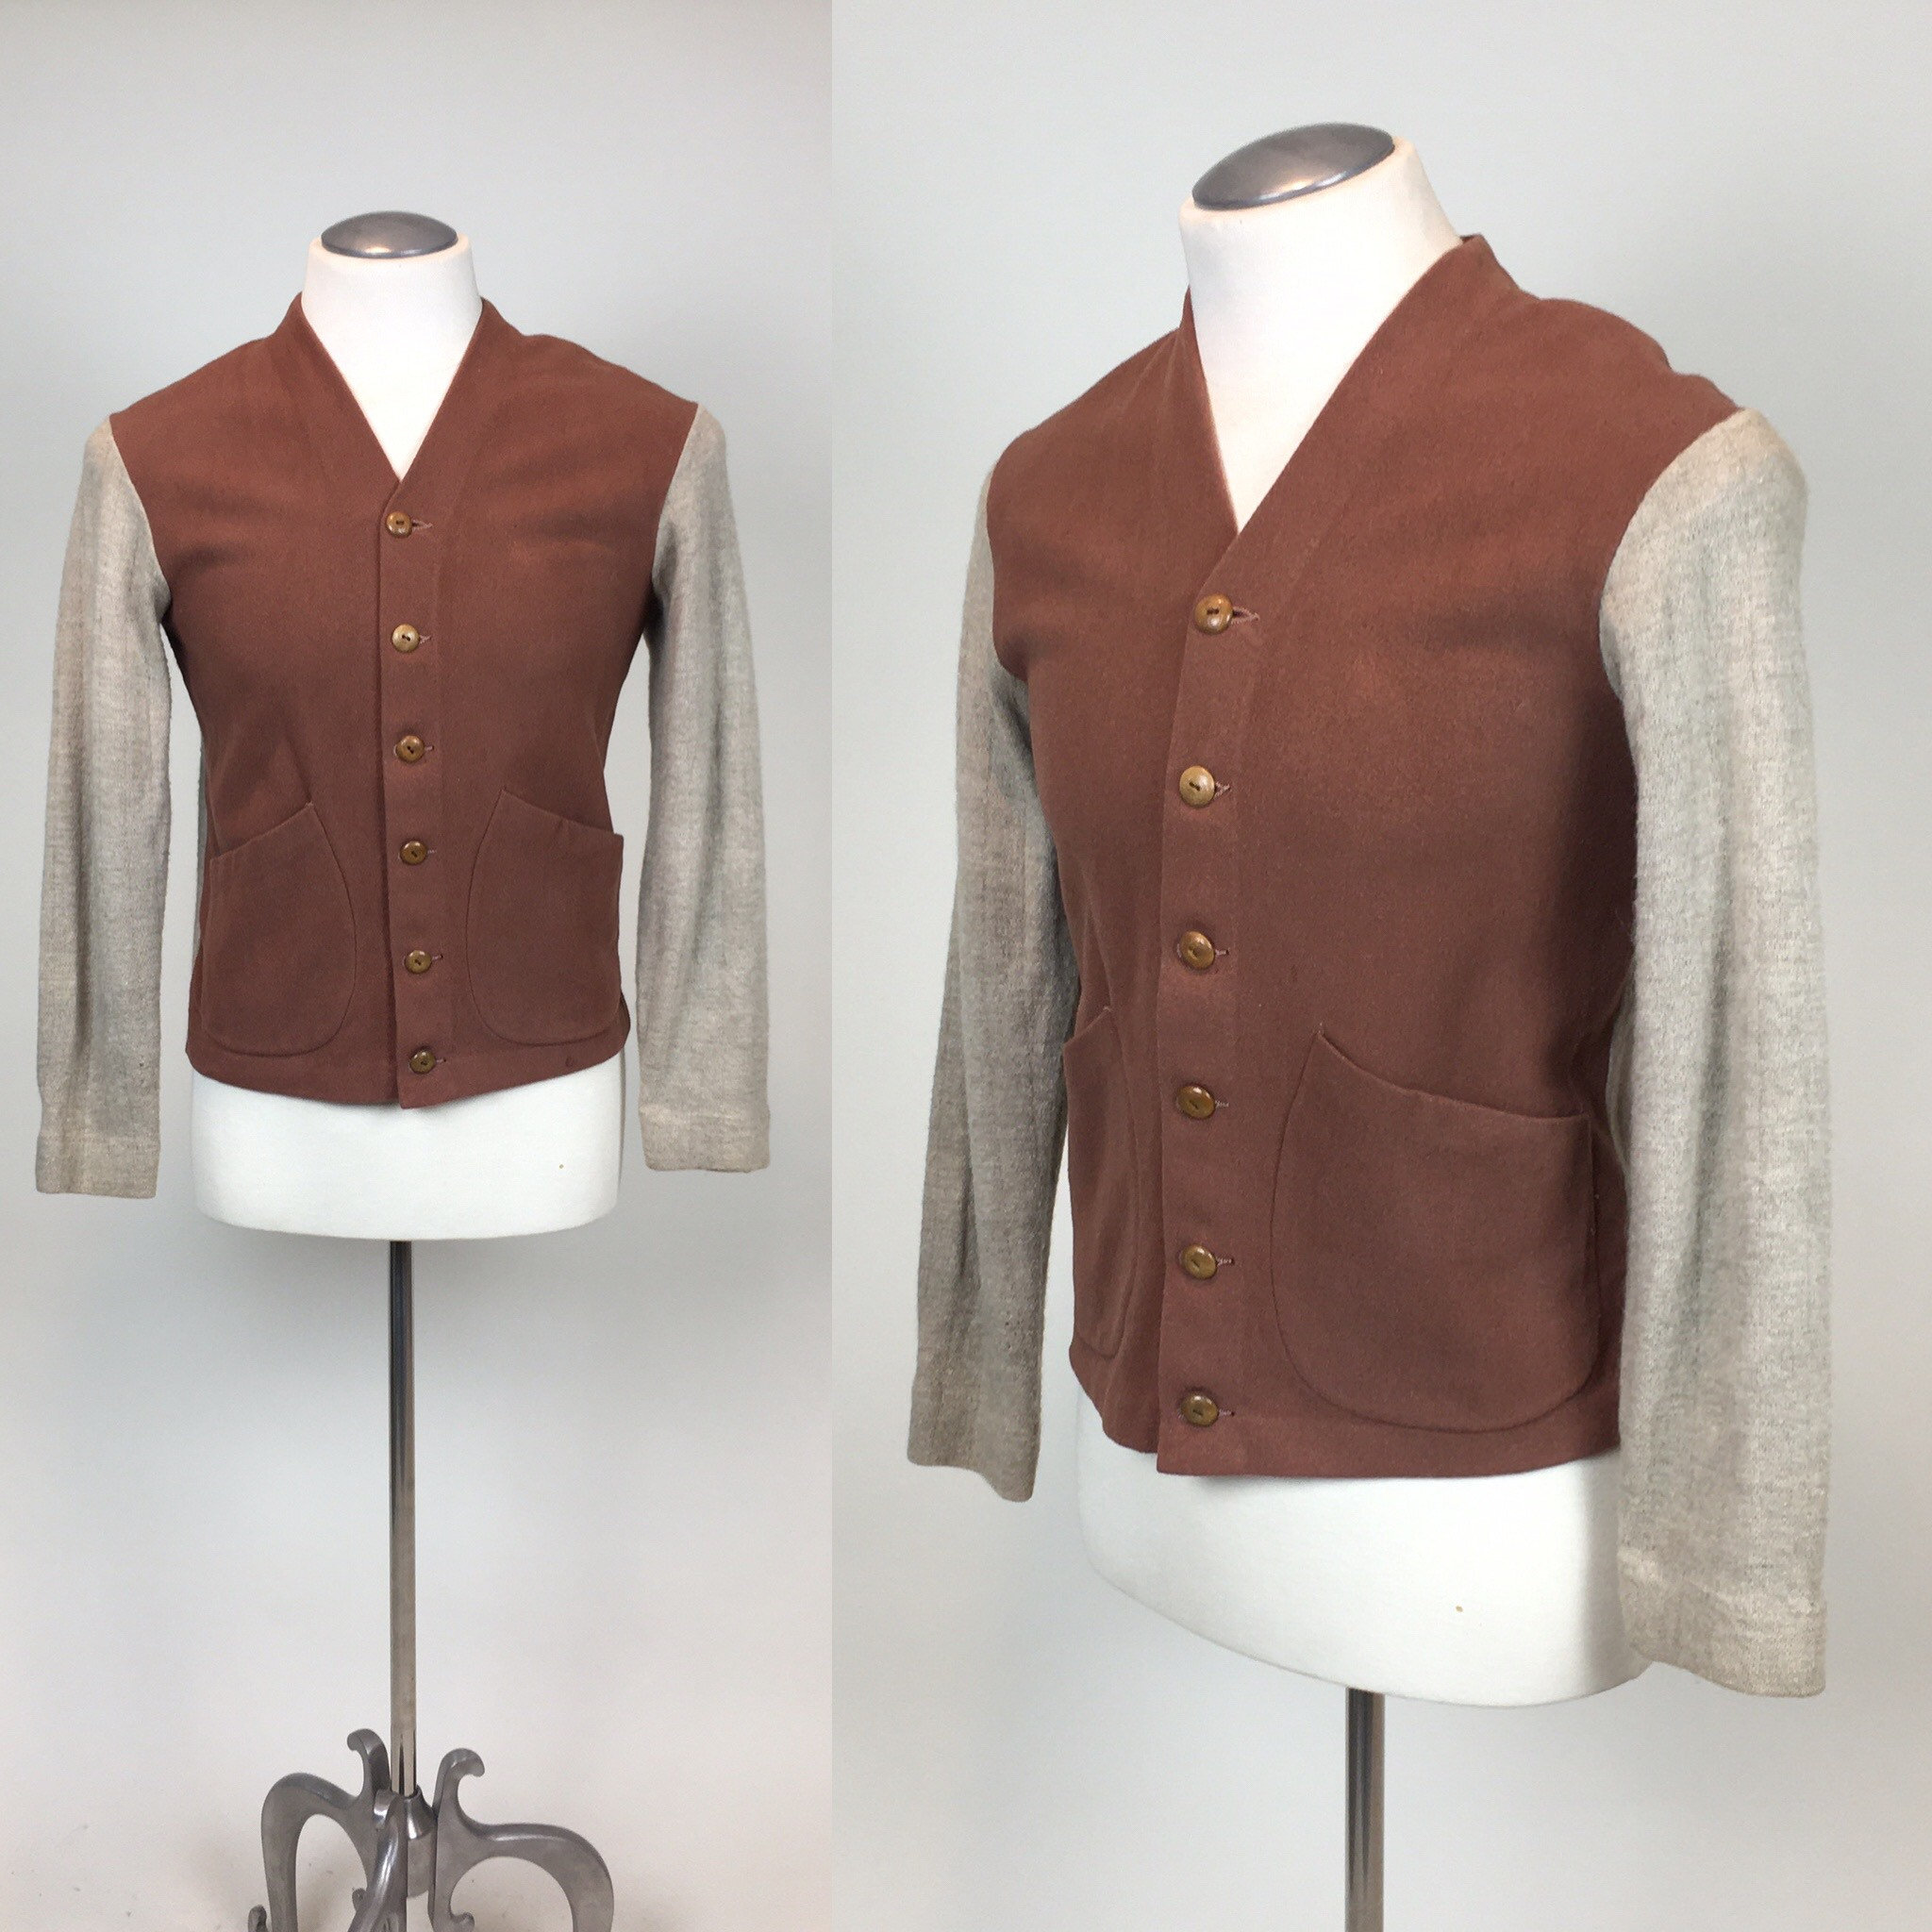 New 1930s Mens Fashion Ties Vintage 1930S 1940S Mens Mcgregor Sportswear Cardigan SweaterTwo Tone Wool Felt Knit $0.00 AT vintagedancer.com